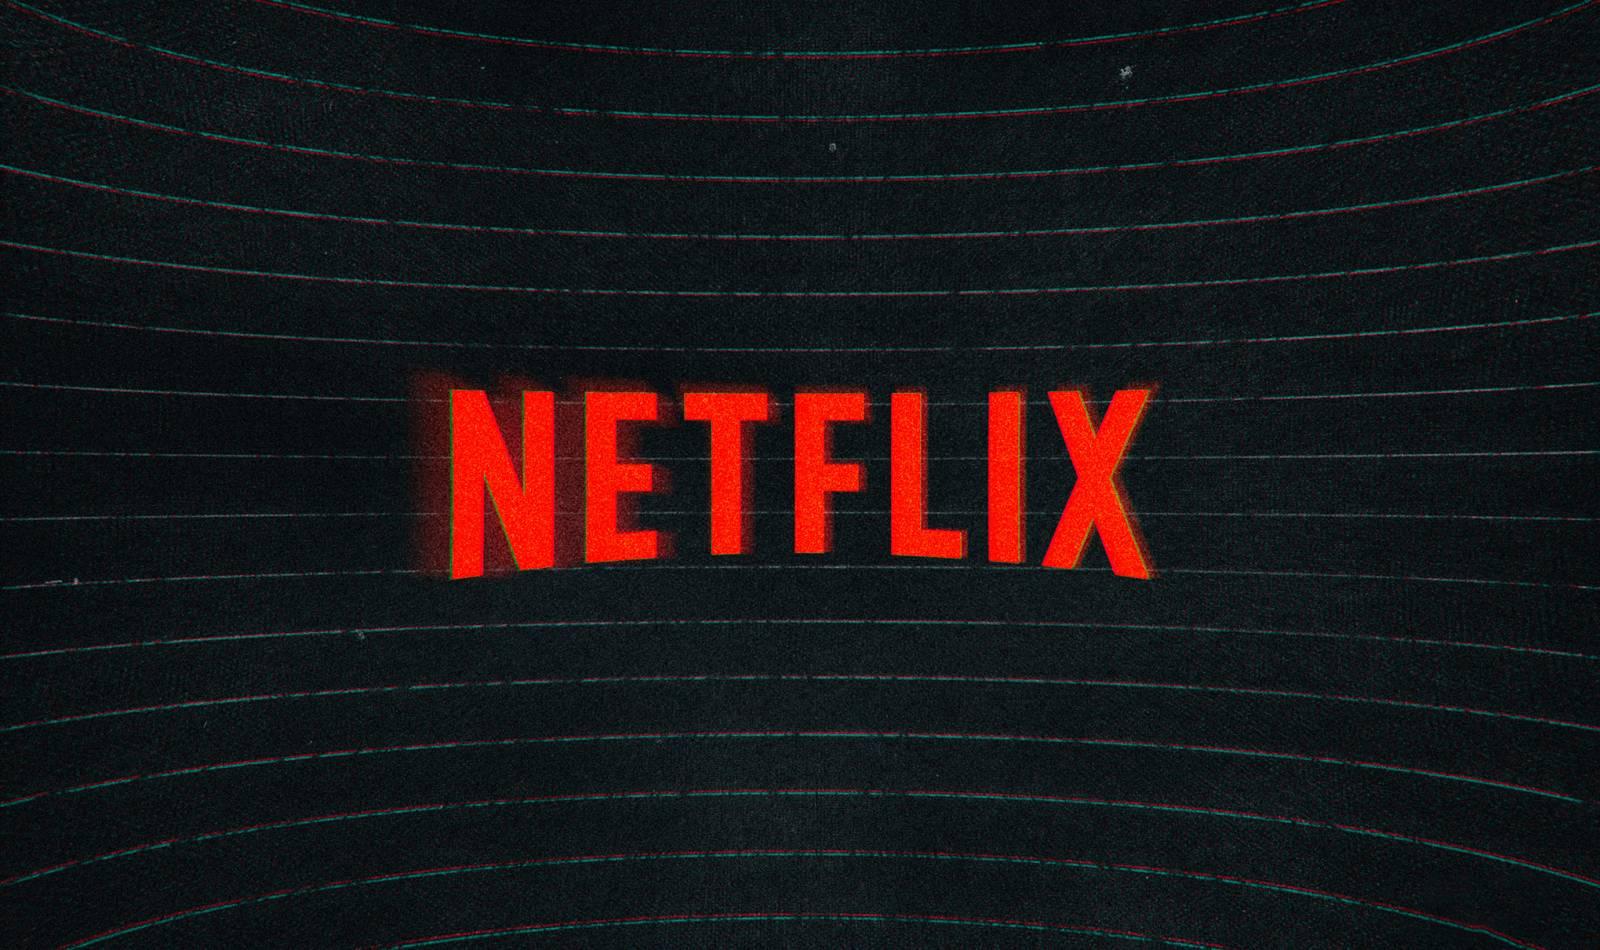 Netflix phishing atac